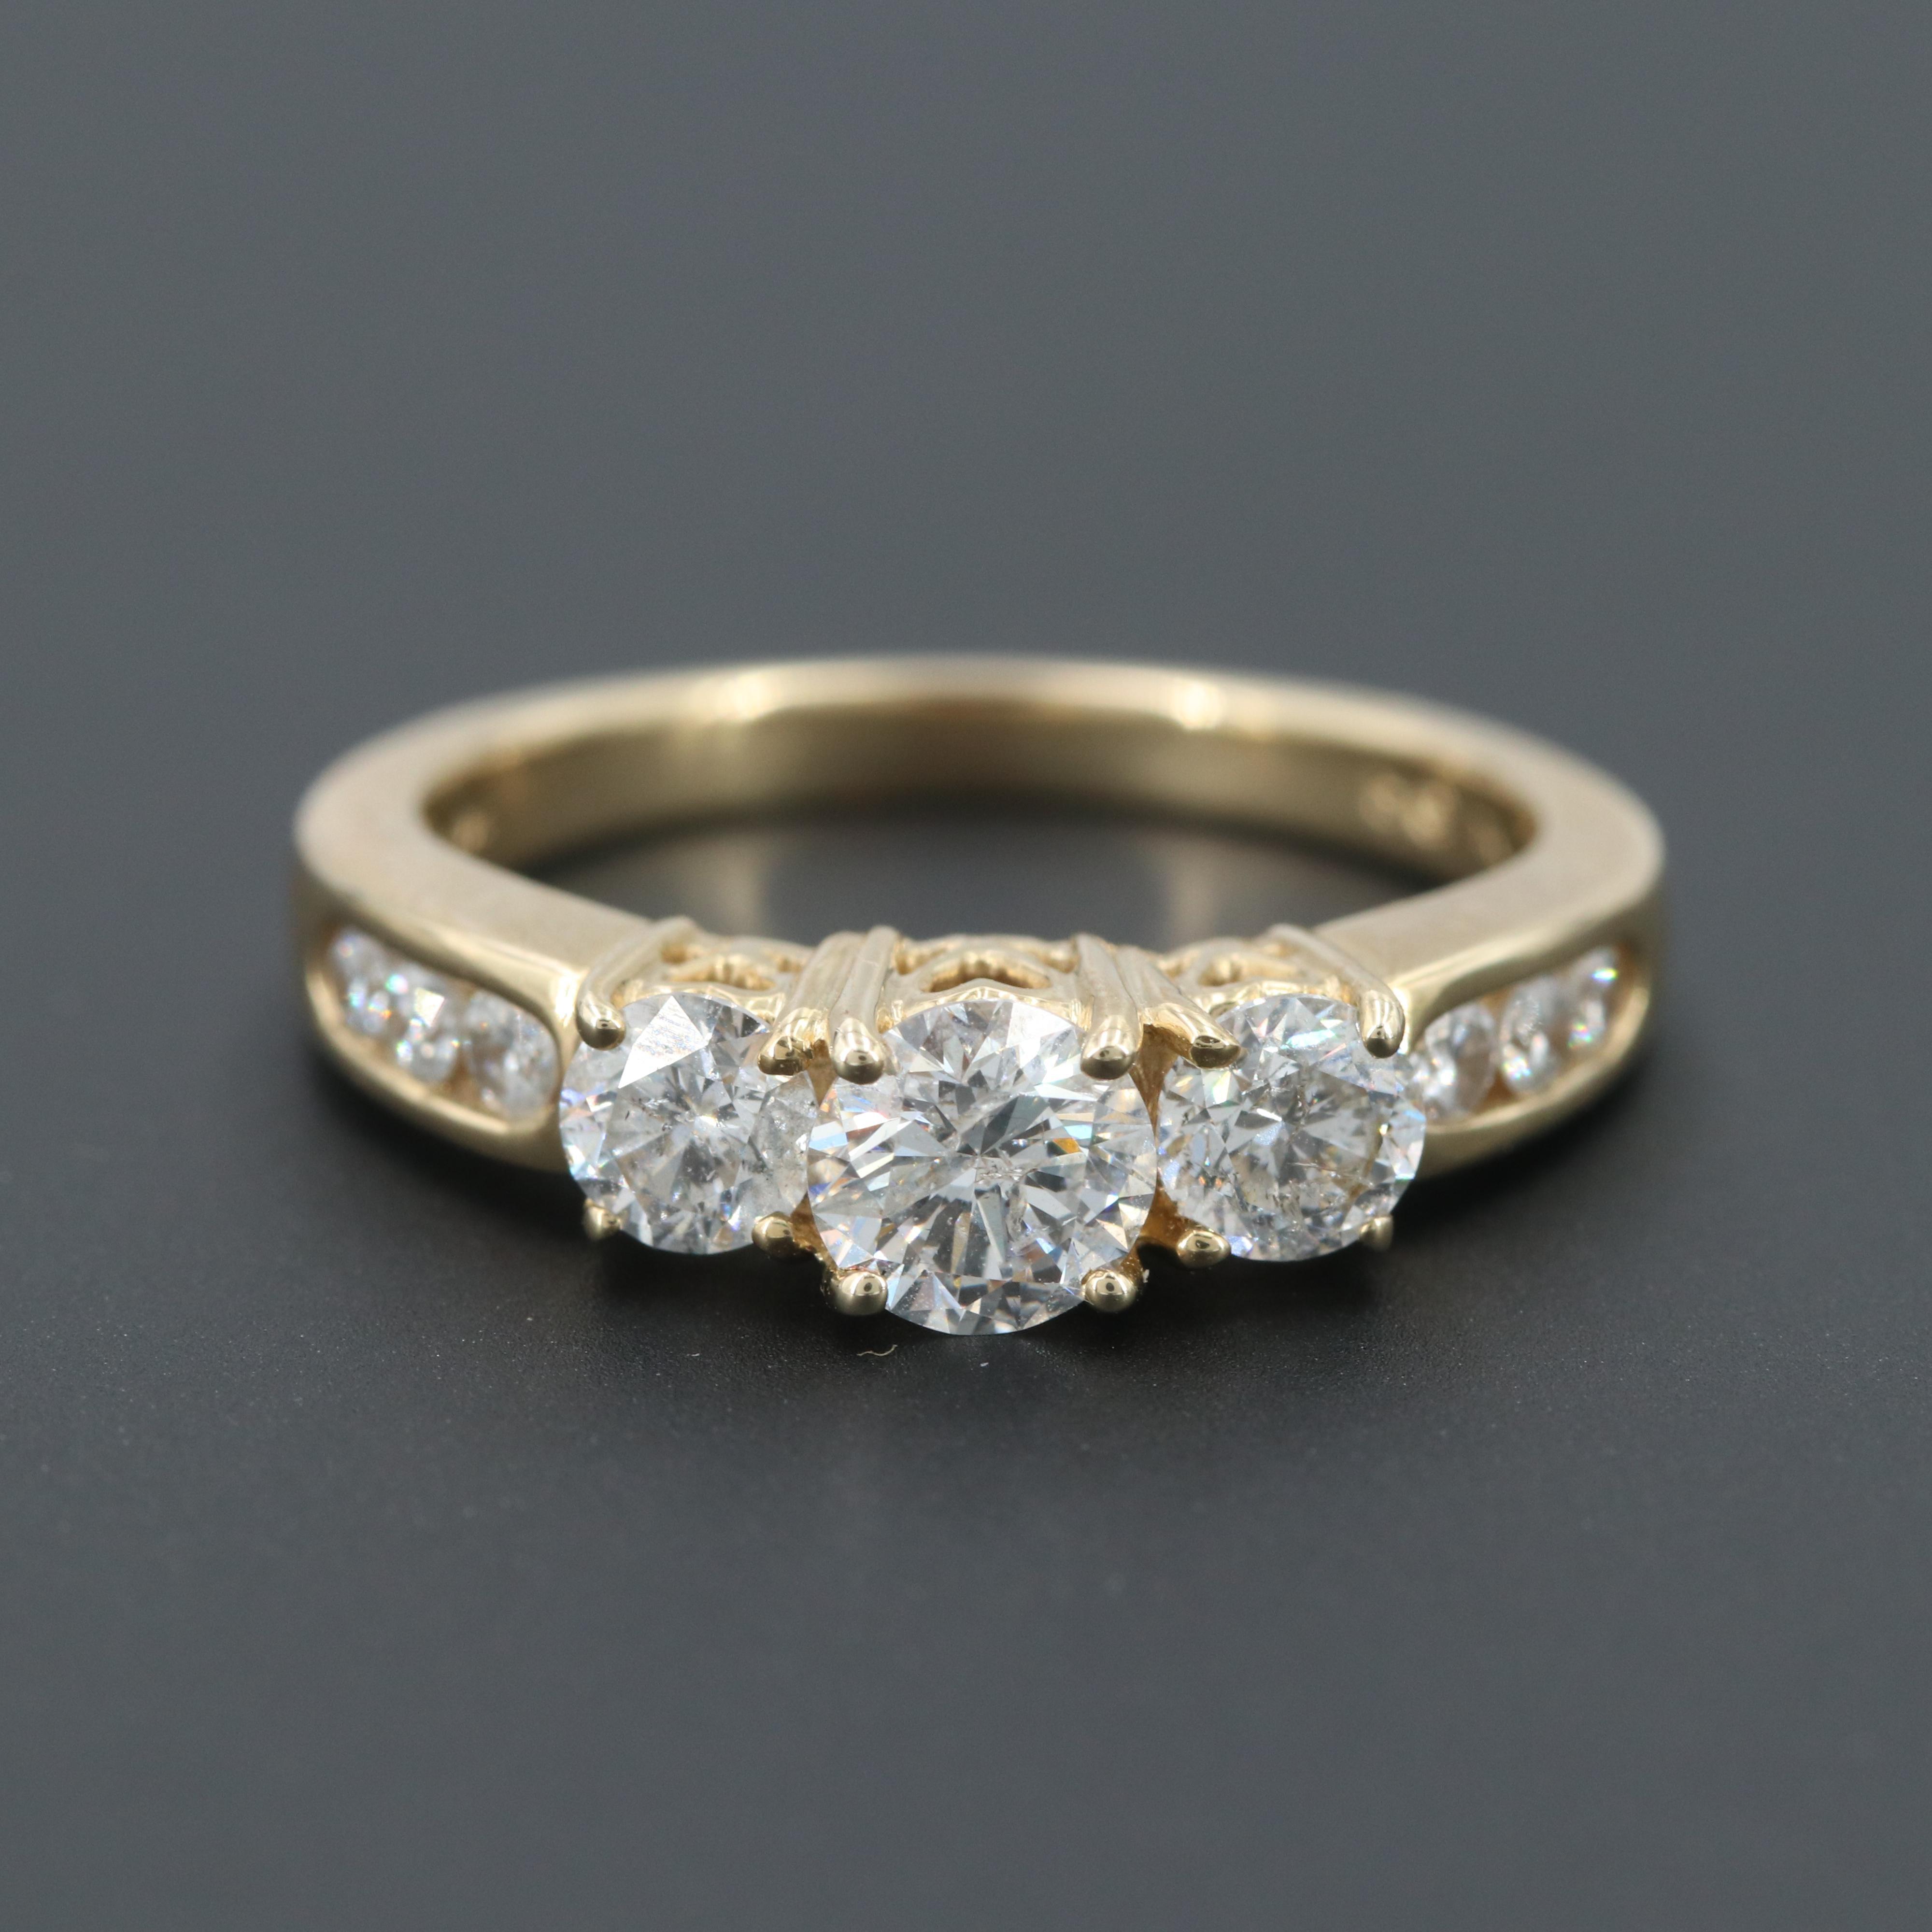 14K Yellow Gold 1.31 CTW Diamond Ring